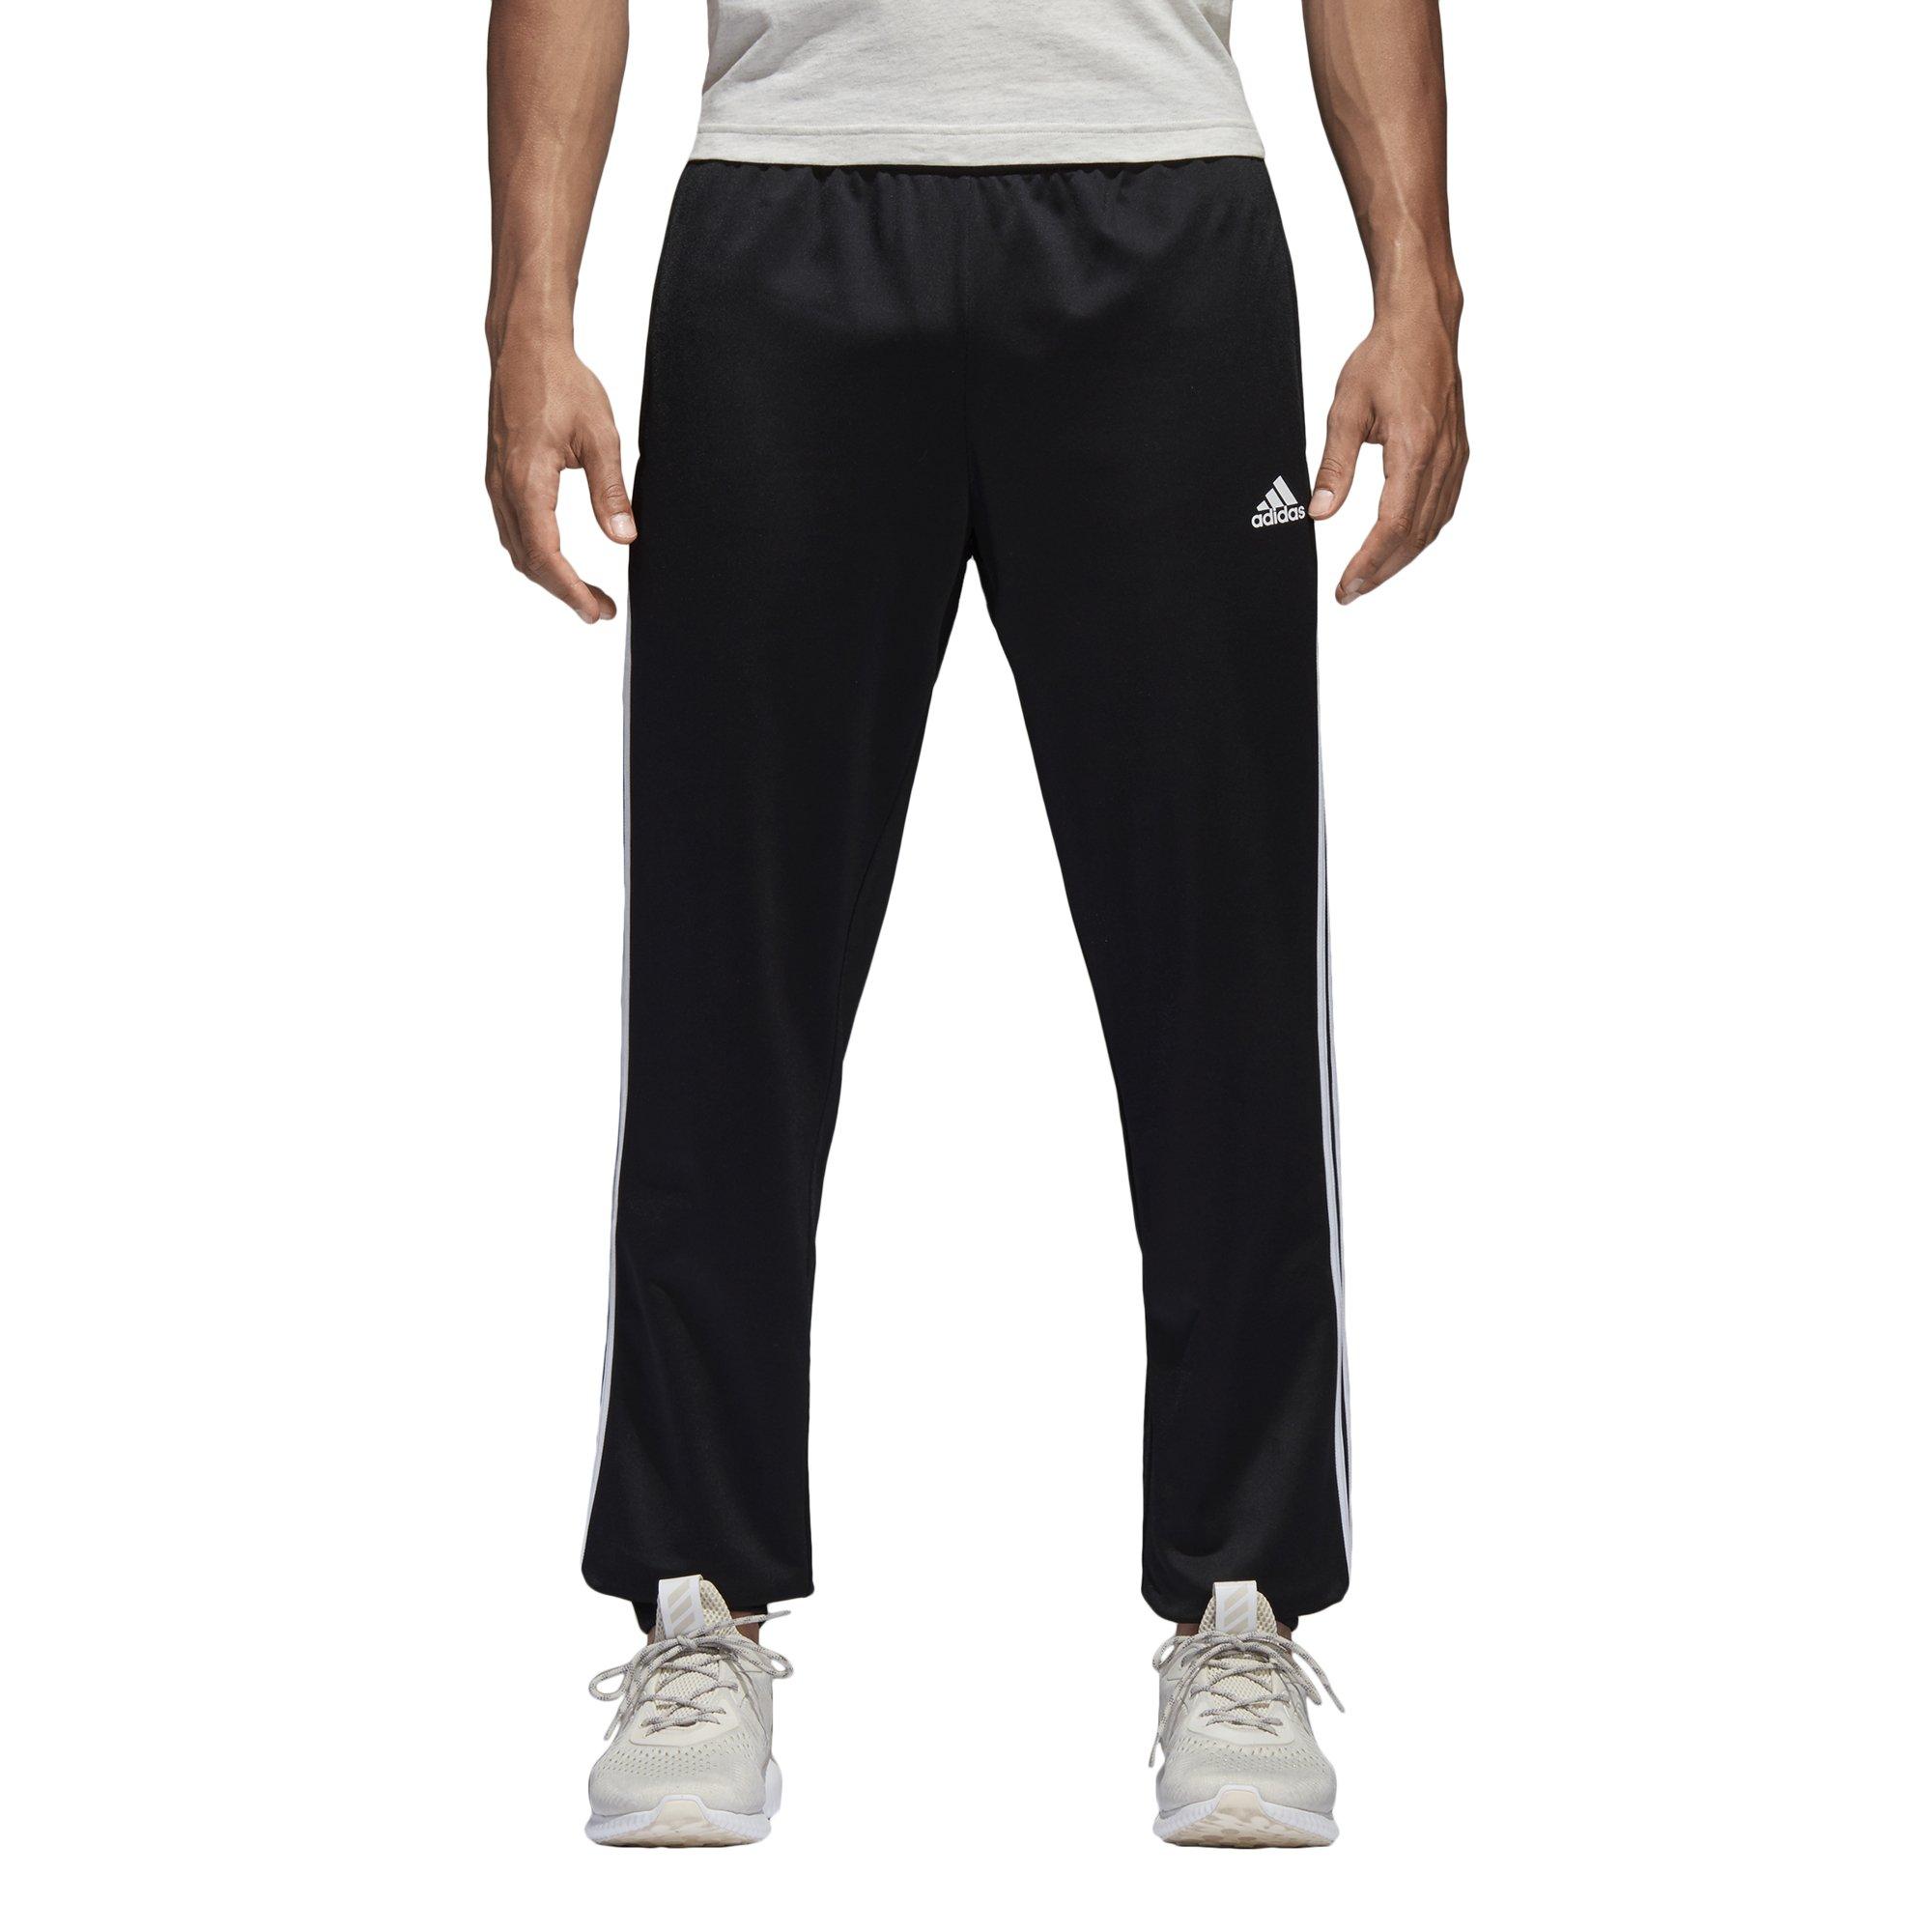 adidas Men's Athletics Essential Tricot 3 Stripe Tapered Pants, Black/White, Large